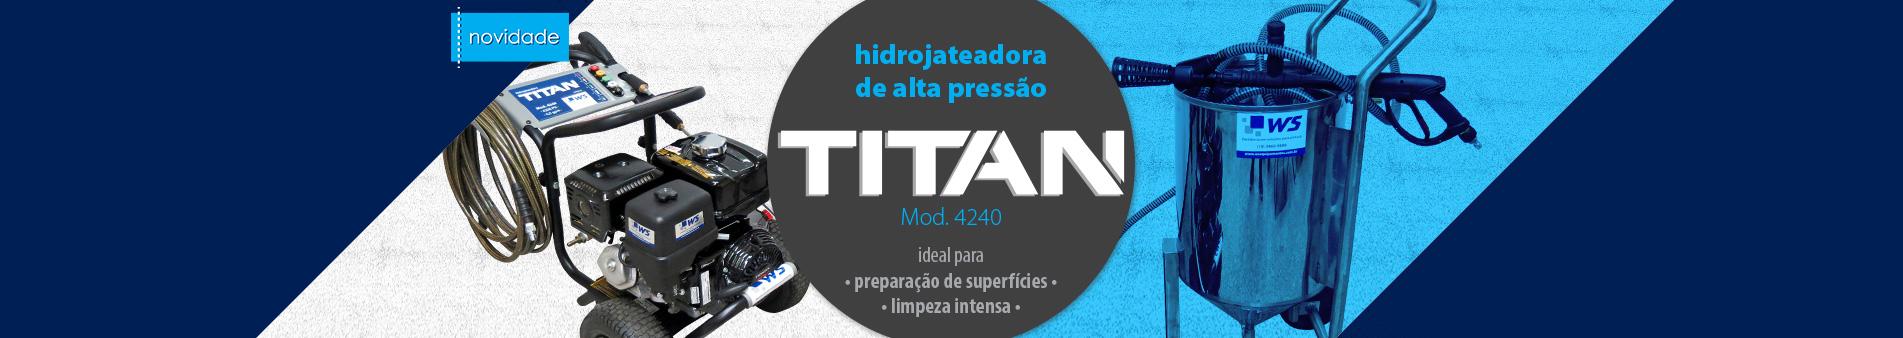 BANNER-Titan-4240